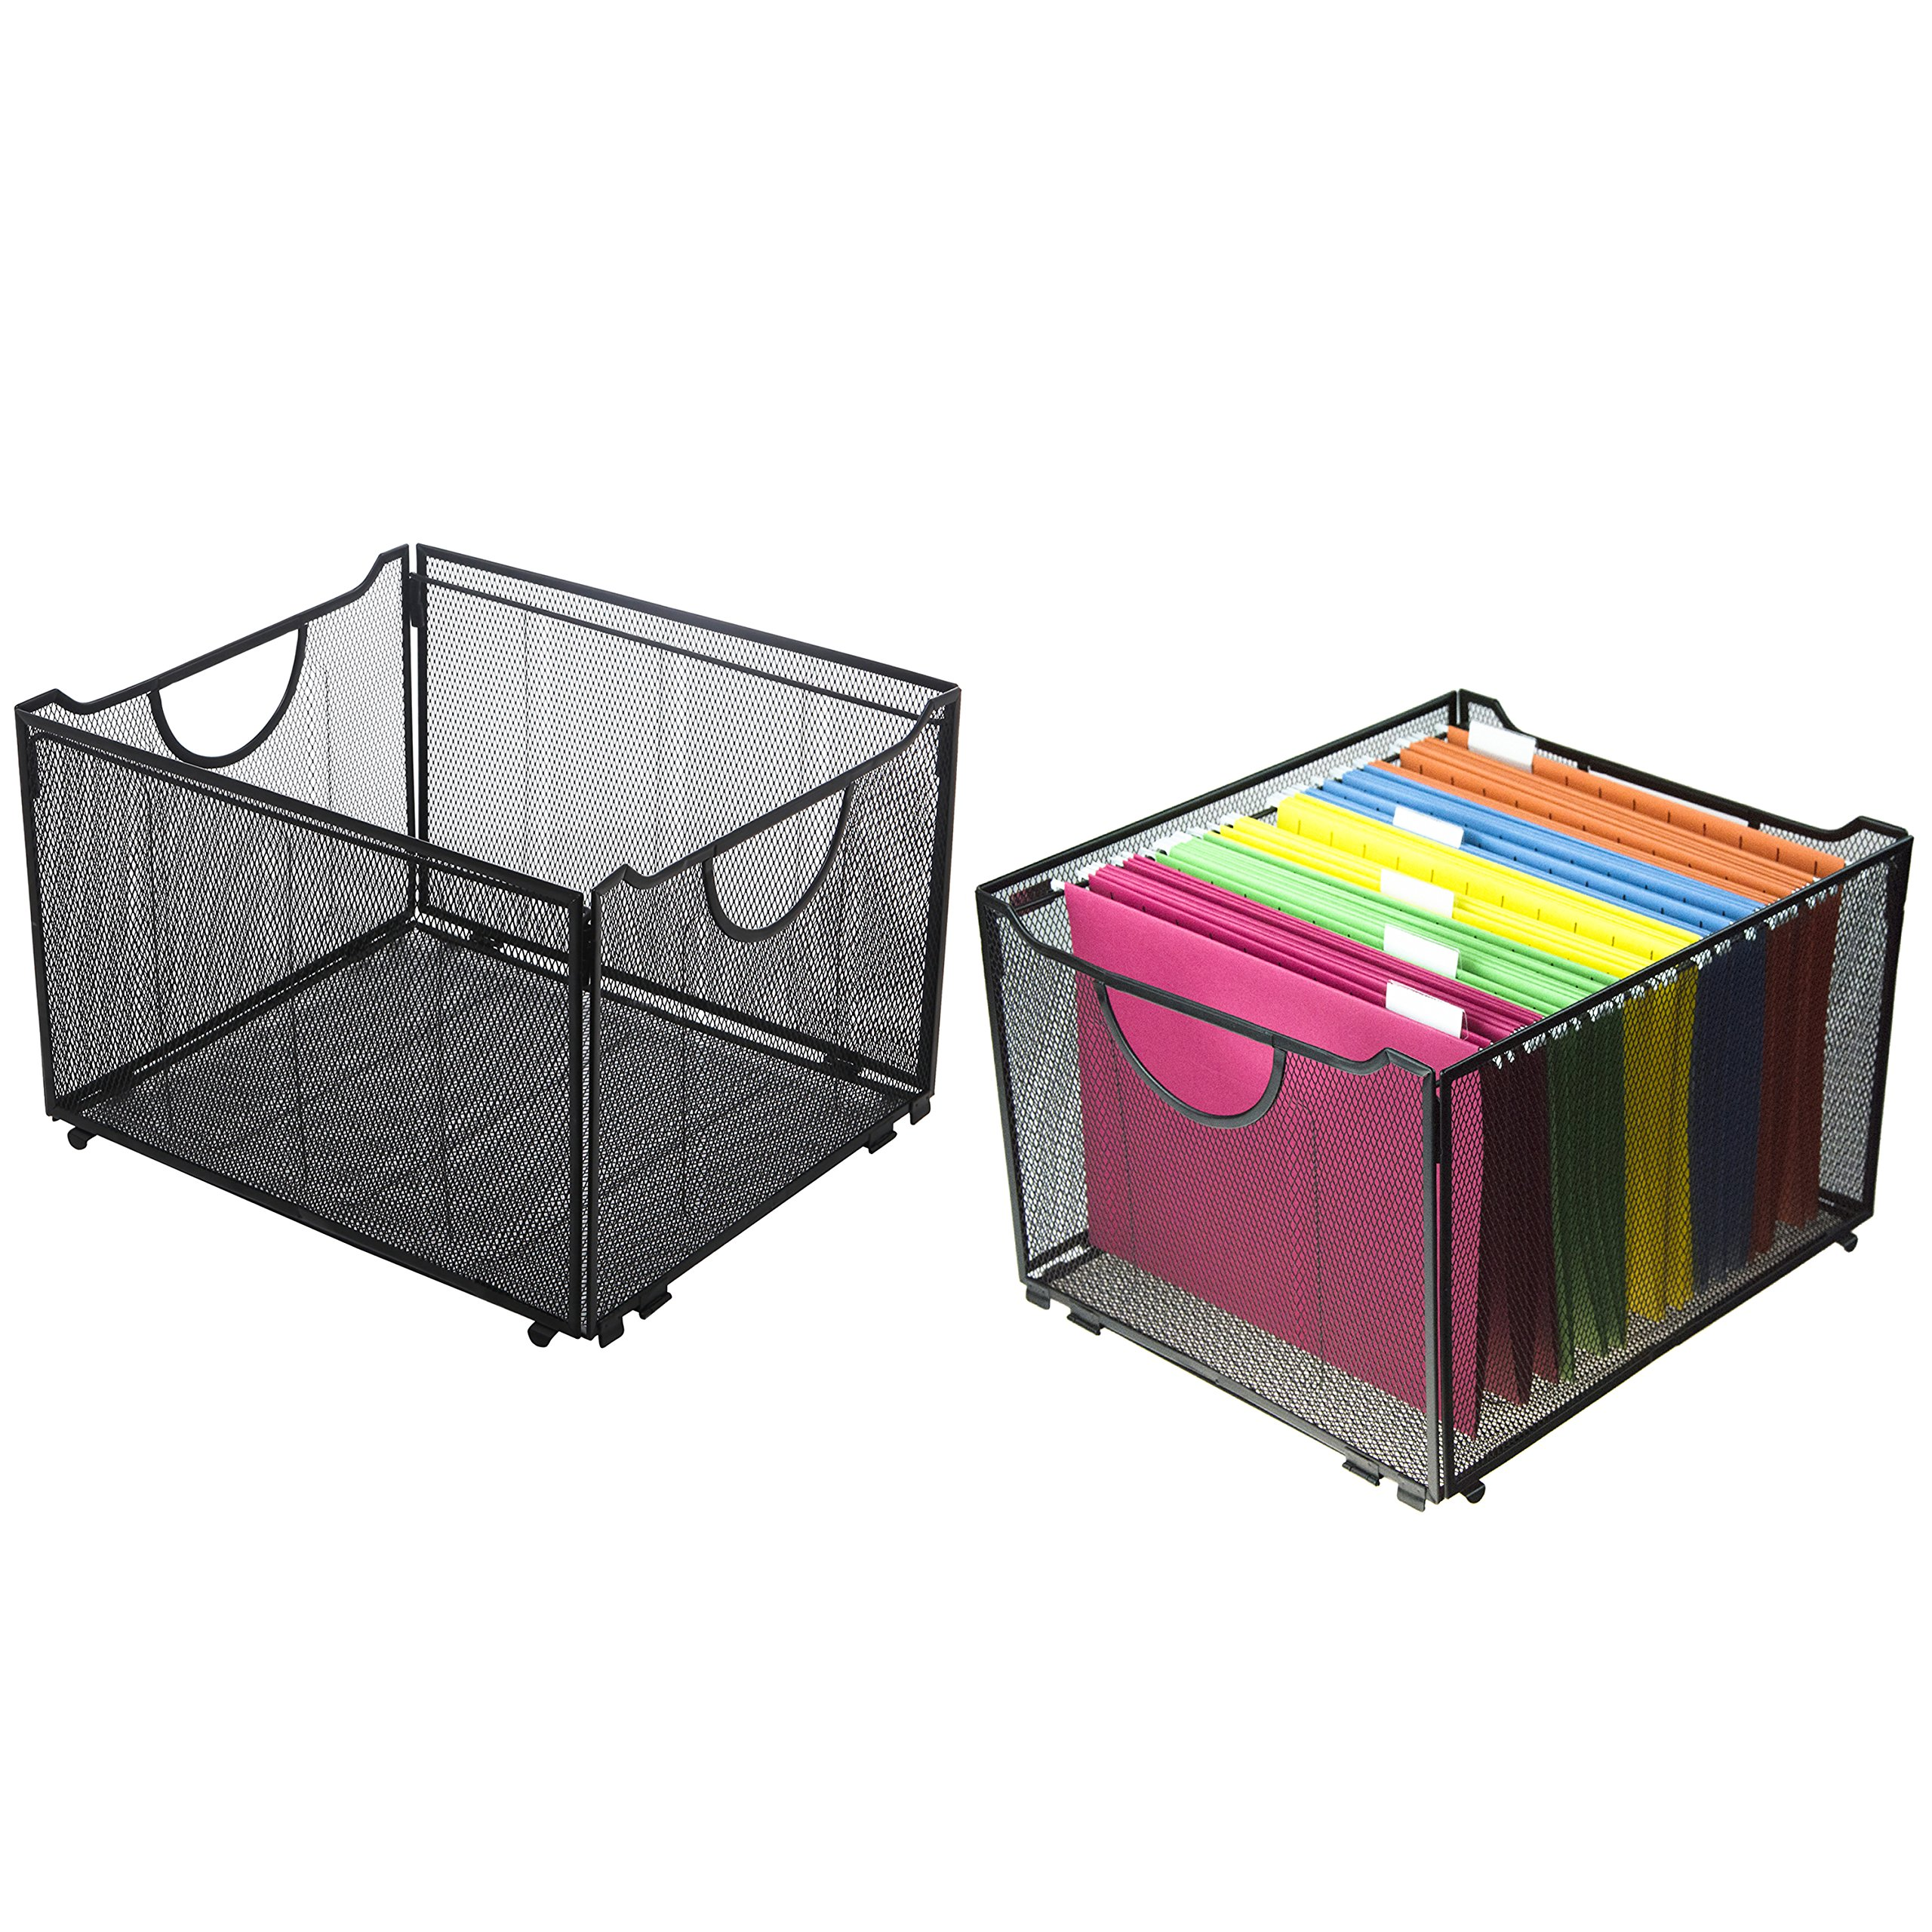 Set of 2 Modern Black Metal Mesh Foldable Office File Folder Organizer Rack Storage Crate